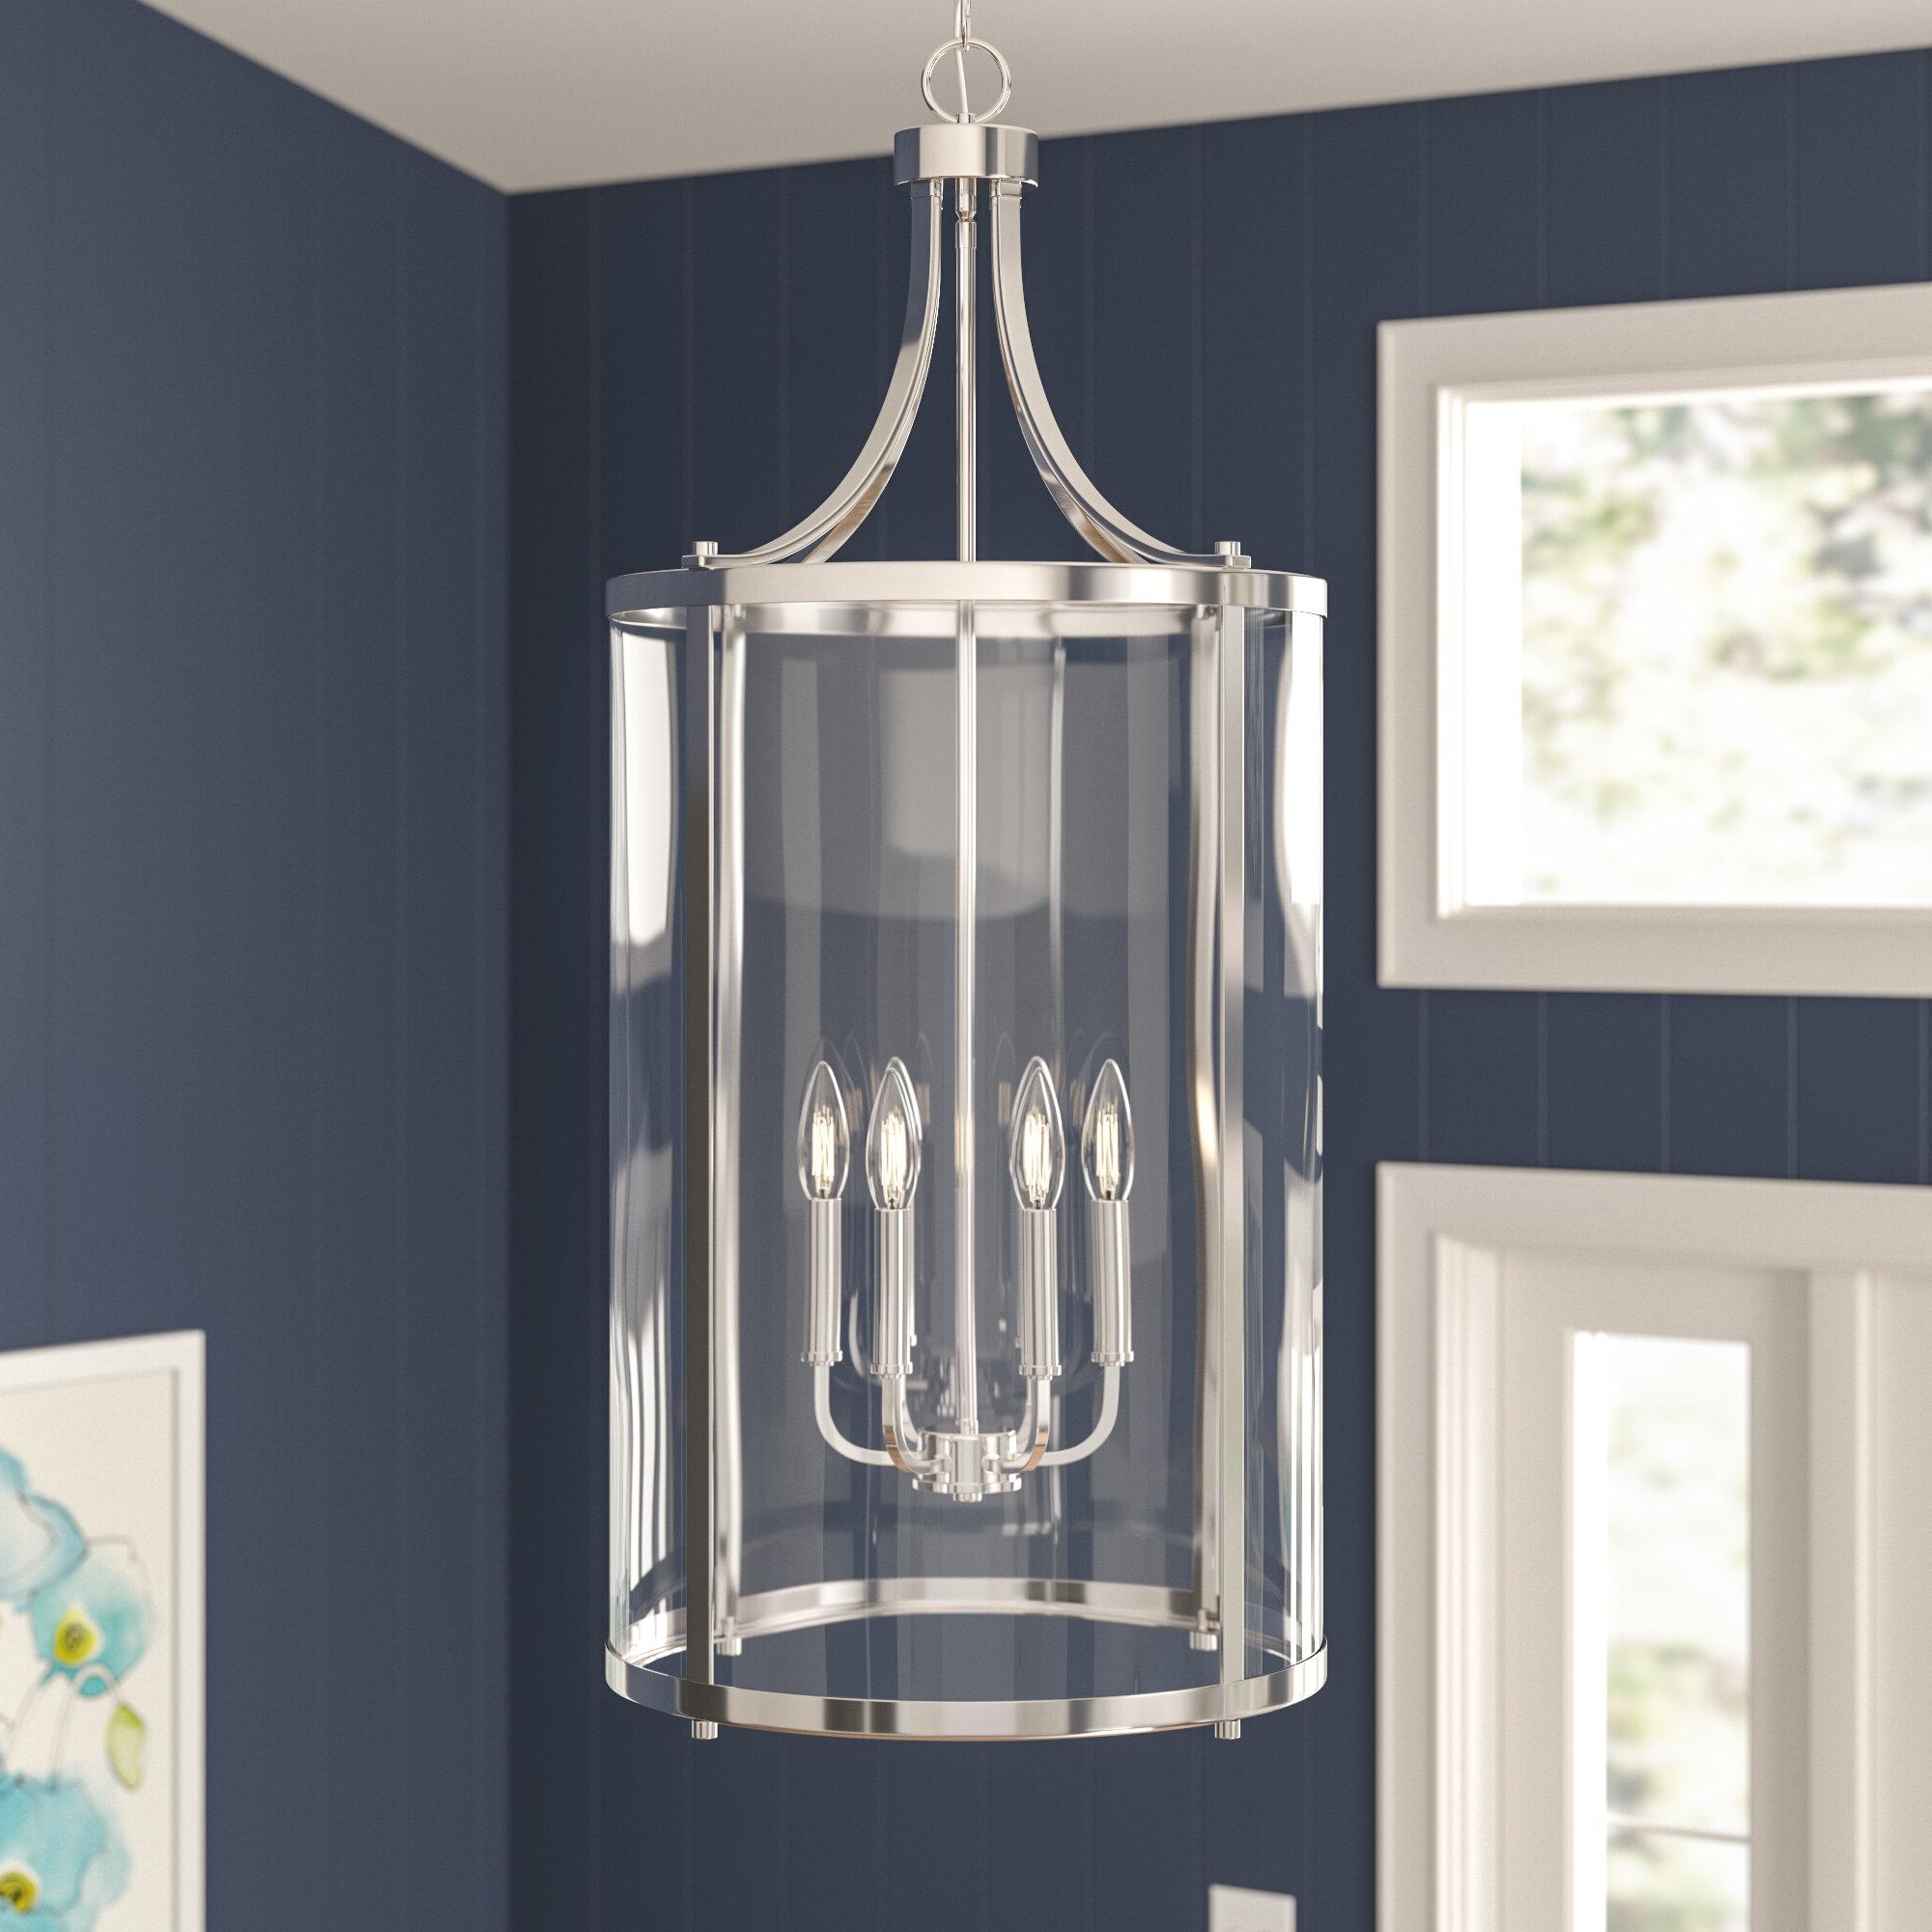 Trendy Three Posts Brookville 6 Light Lantern Pendant Intended For Nisbet 6 Light Lantern Geometric Pendants (View 15 of 20)